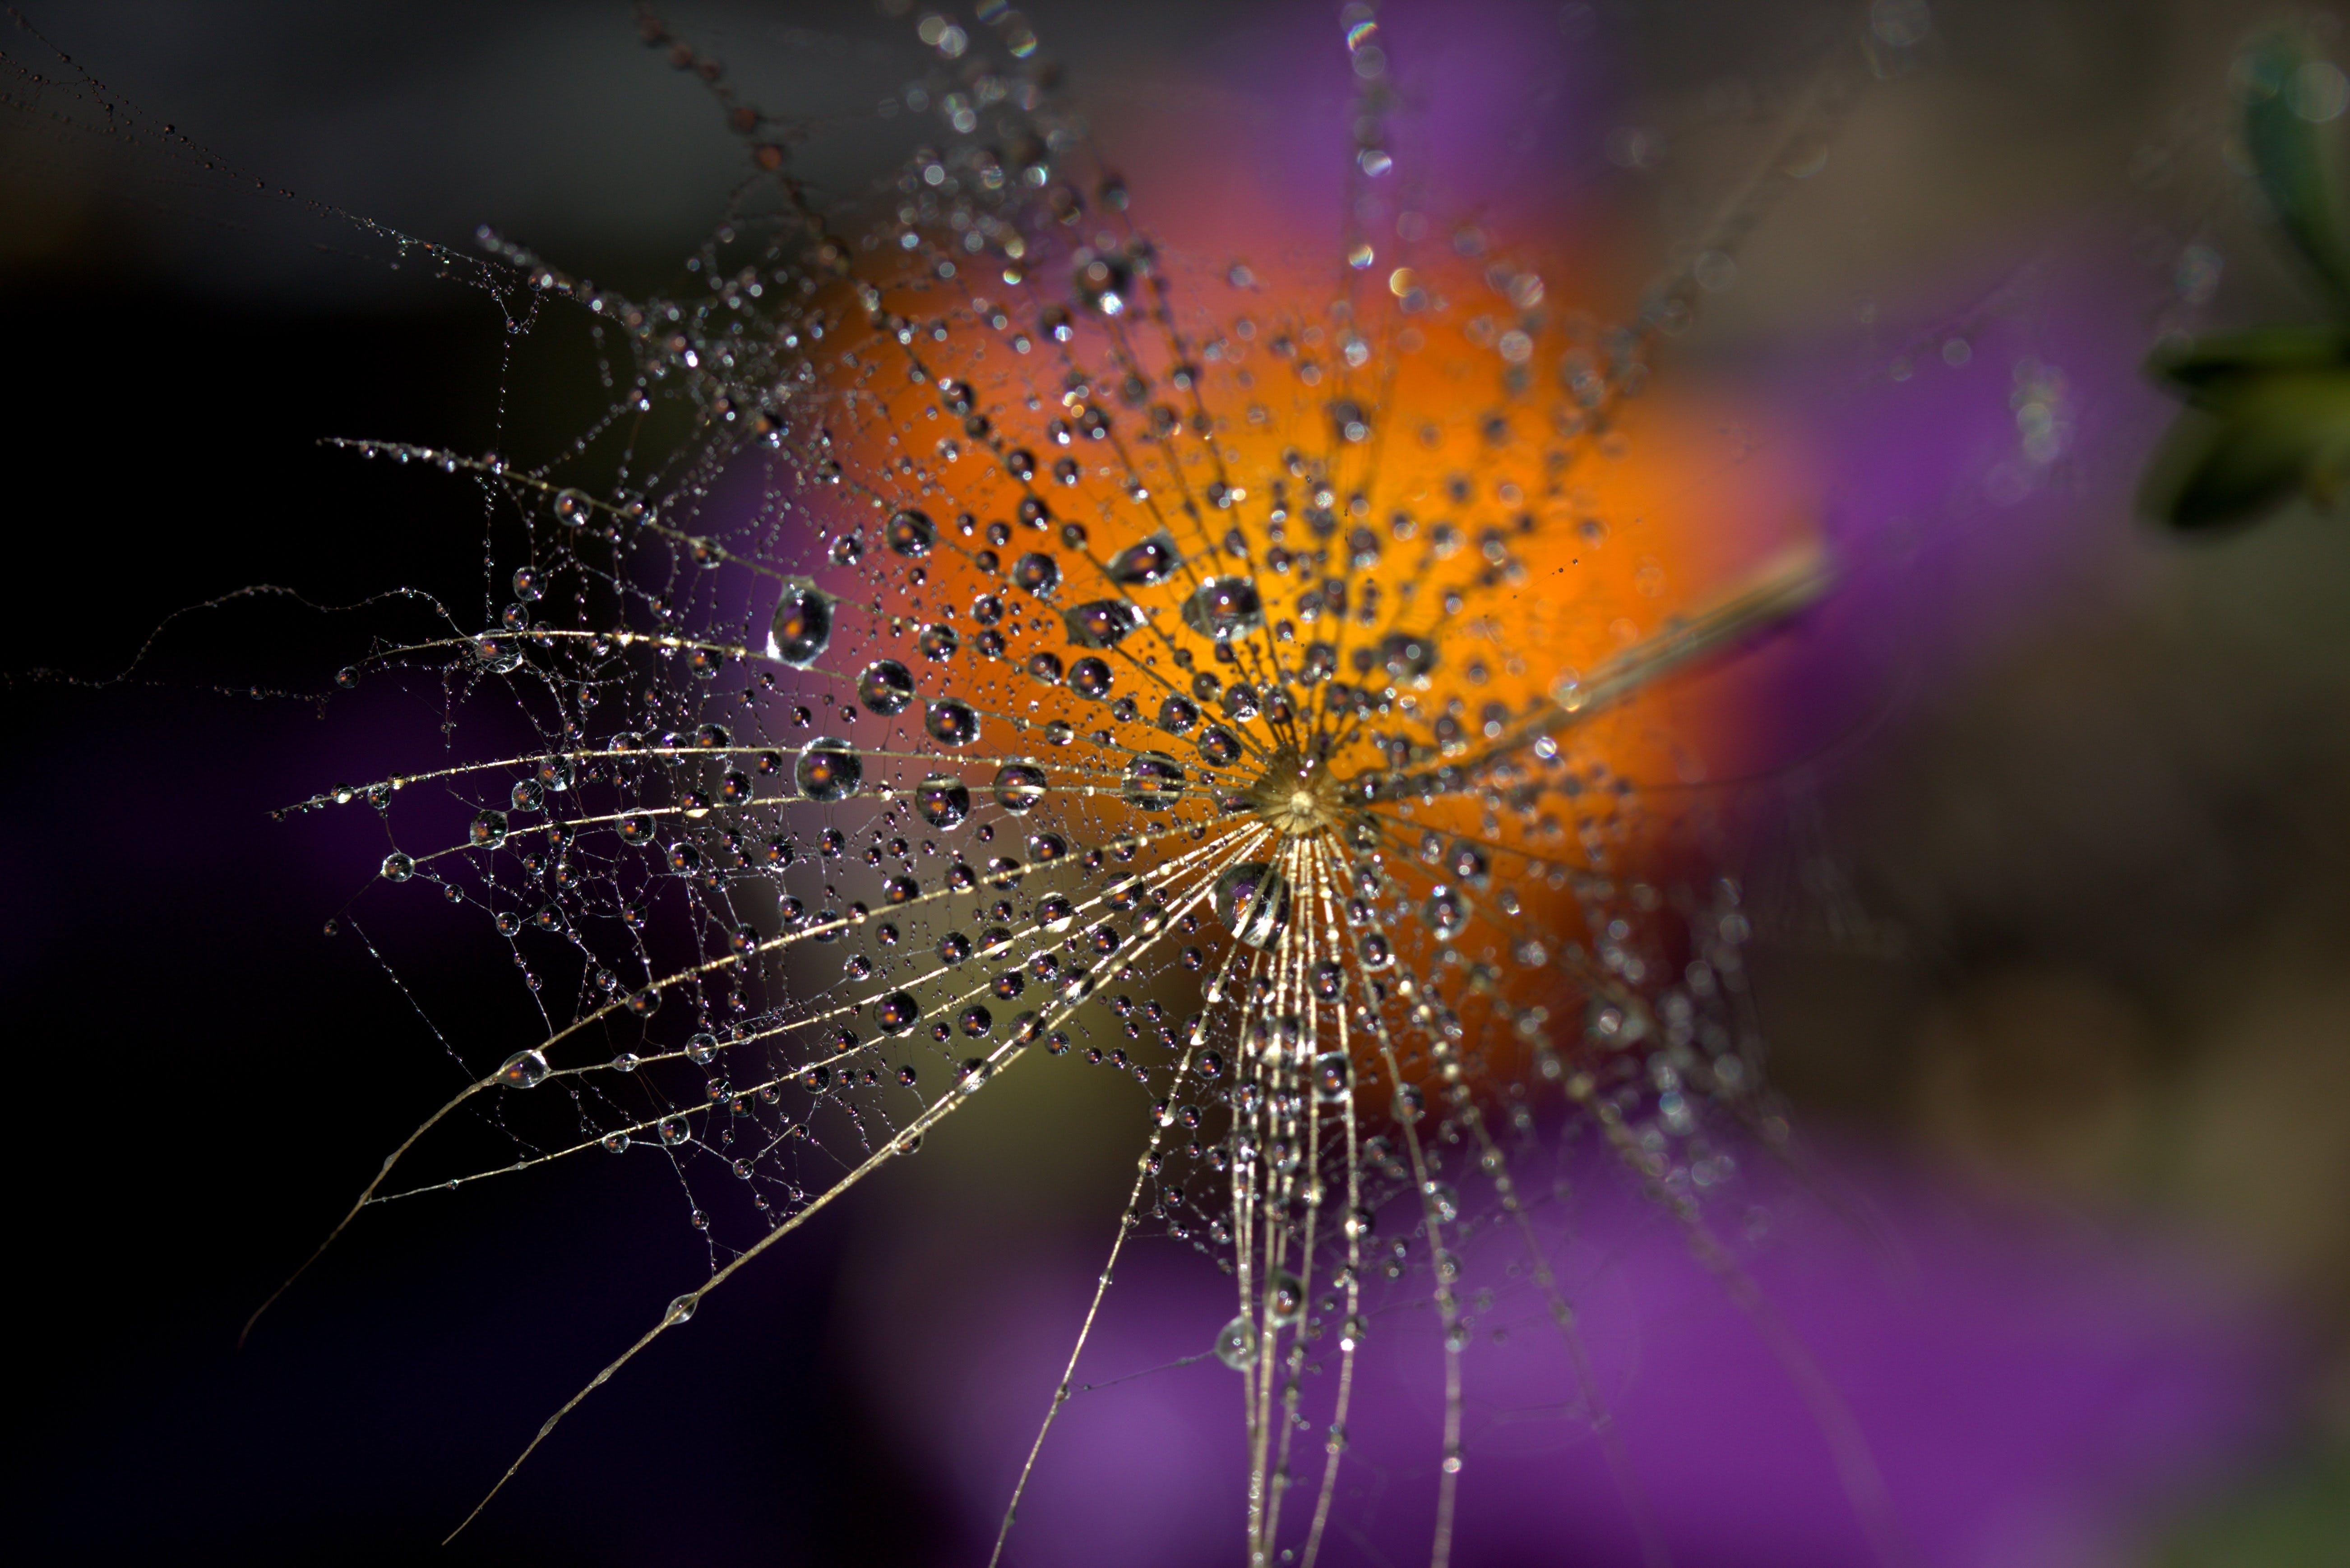 blur, close-up, dewdrops